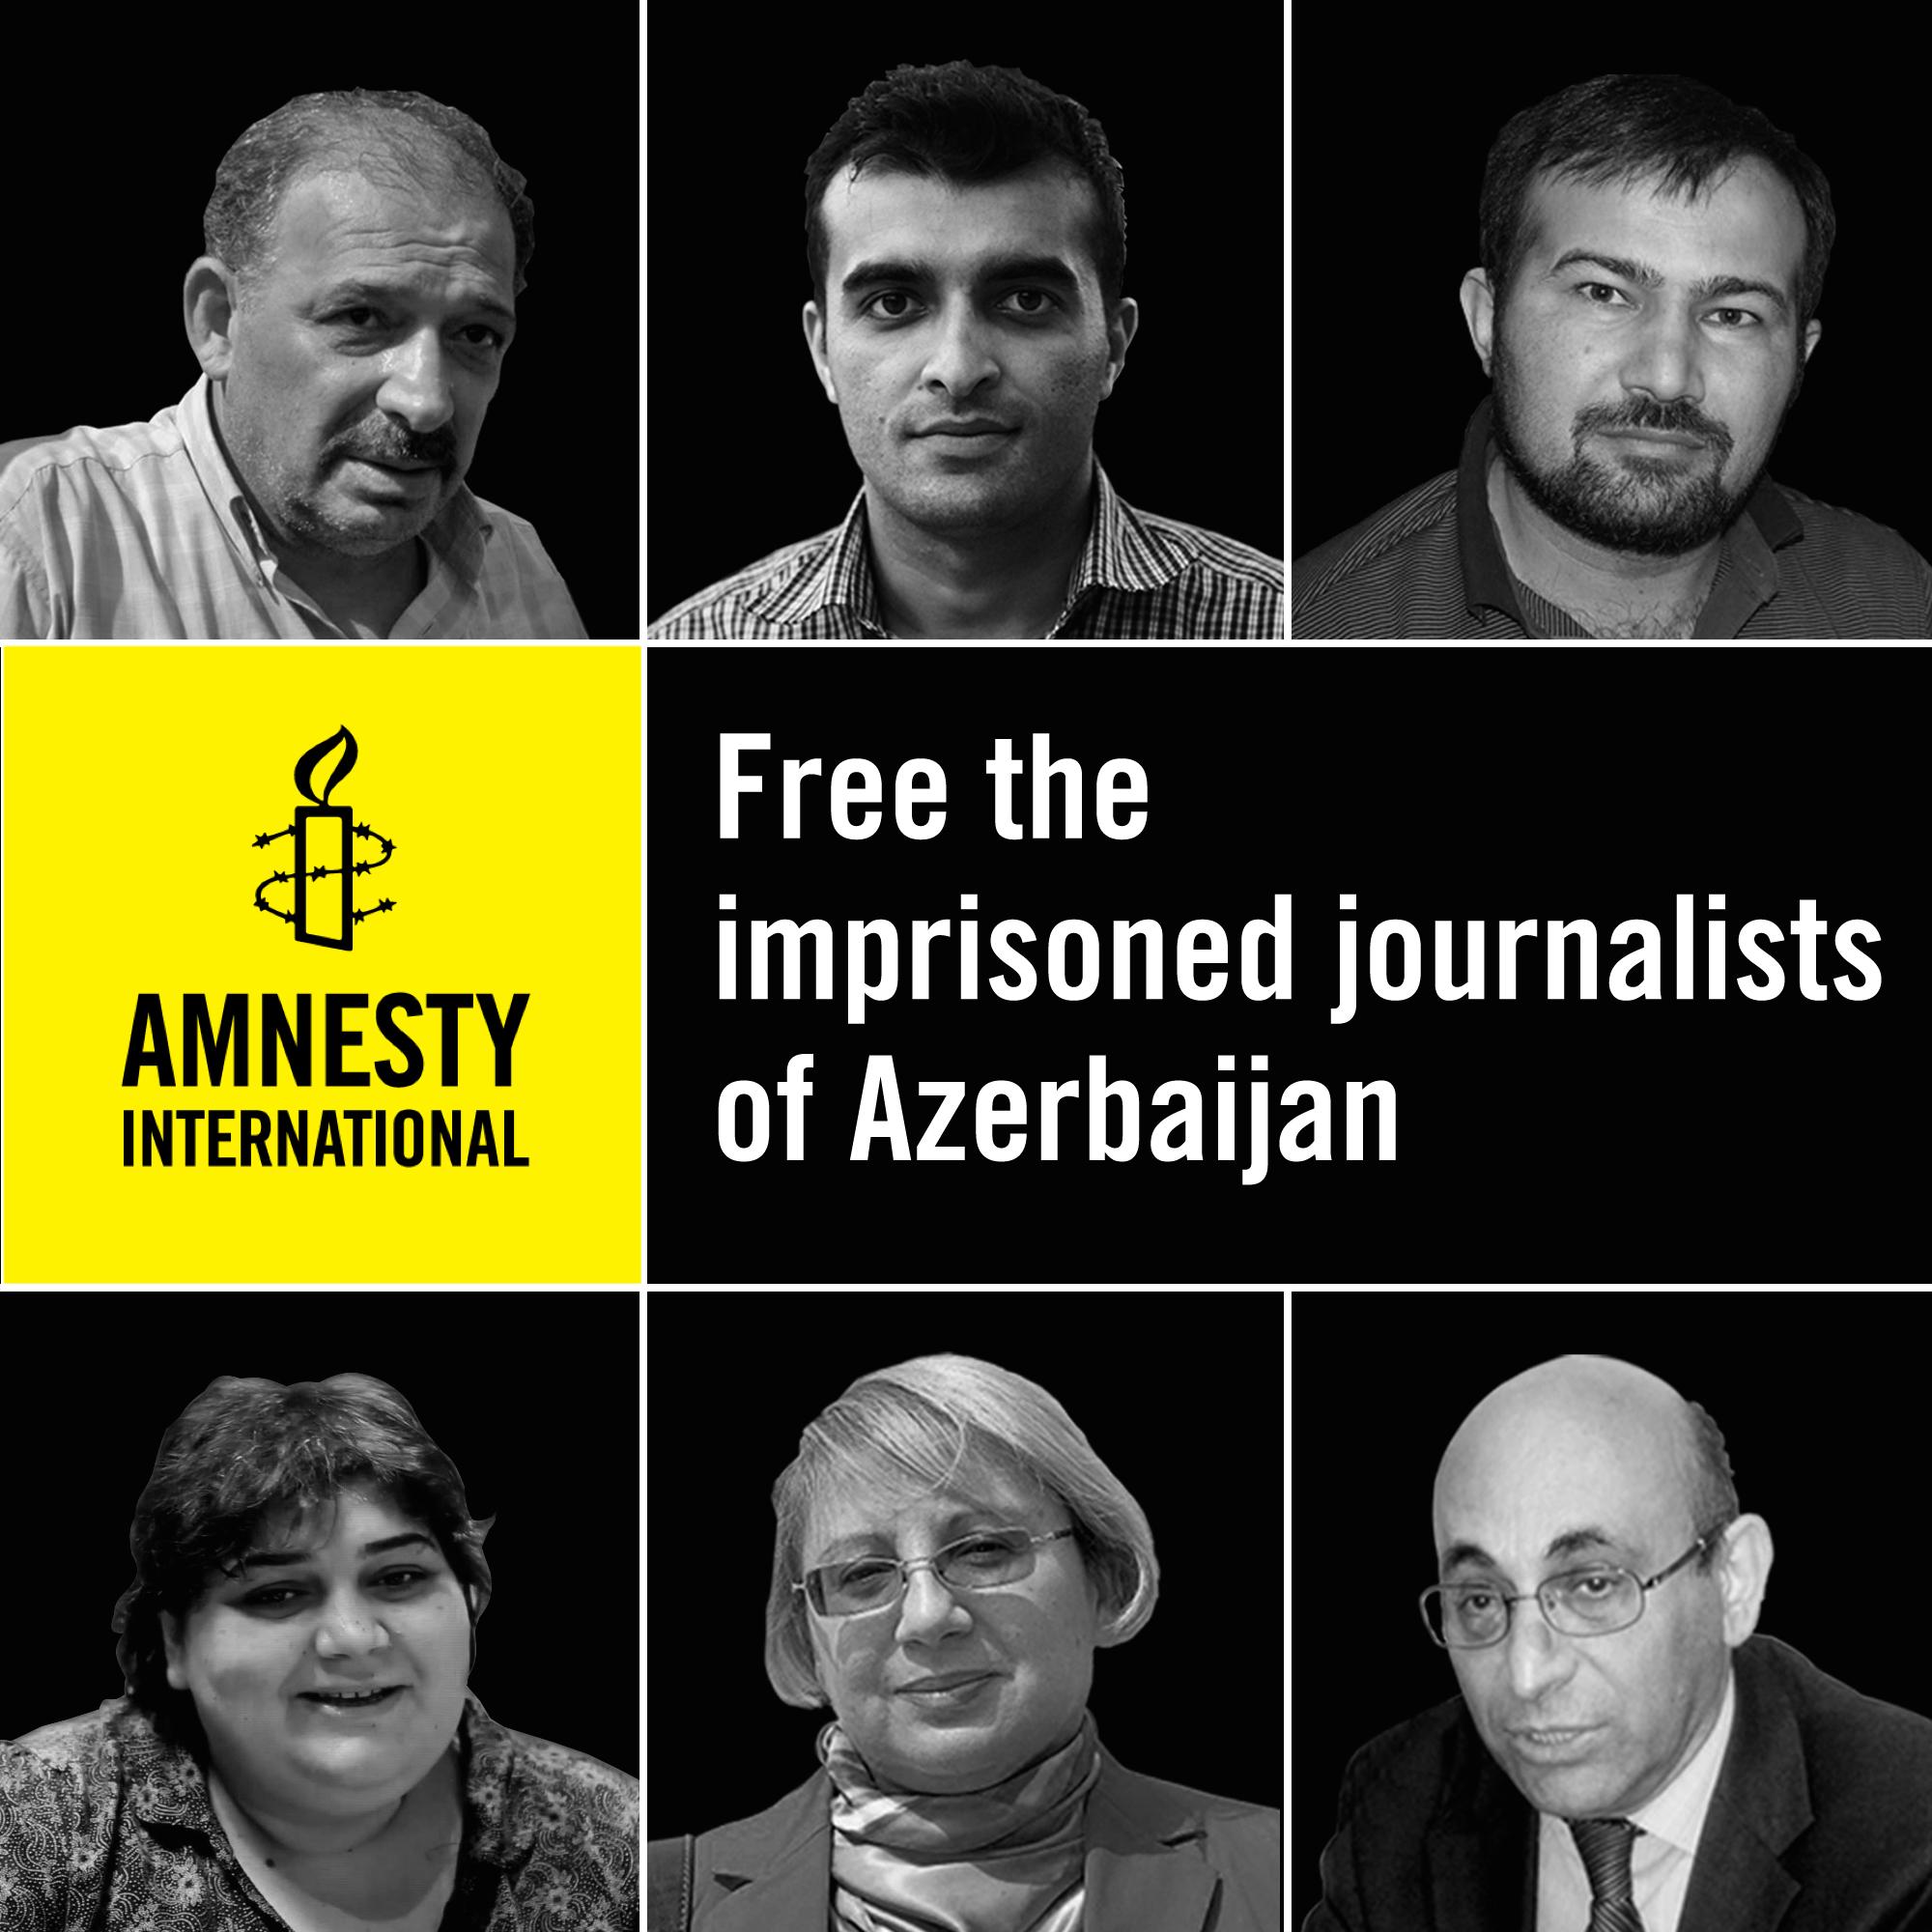 azerbaijan_journos_grid